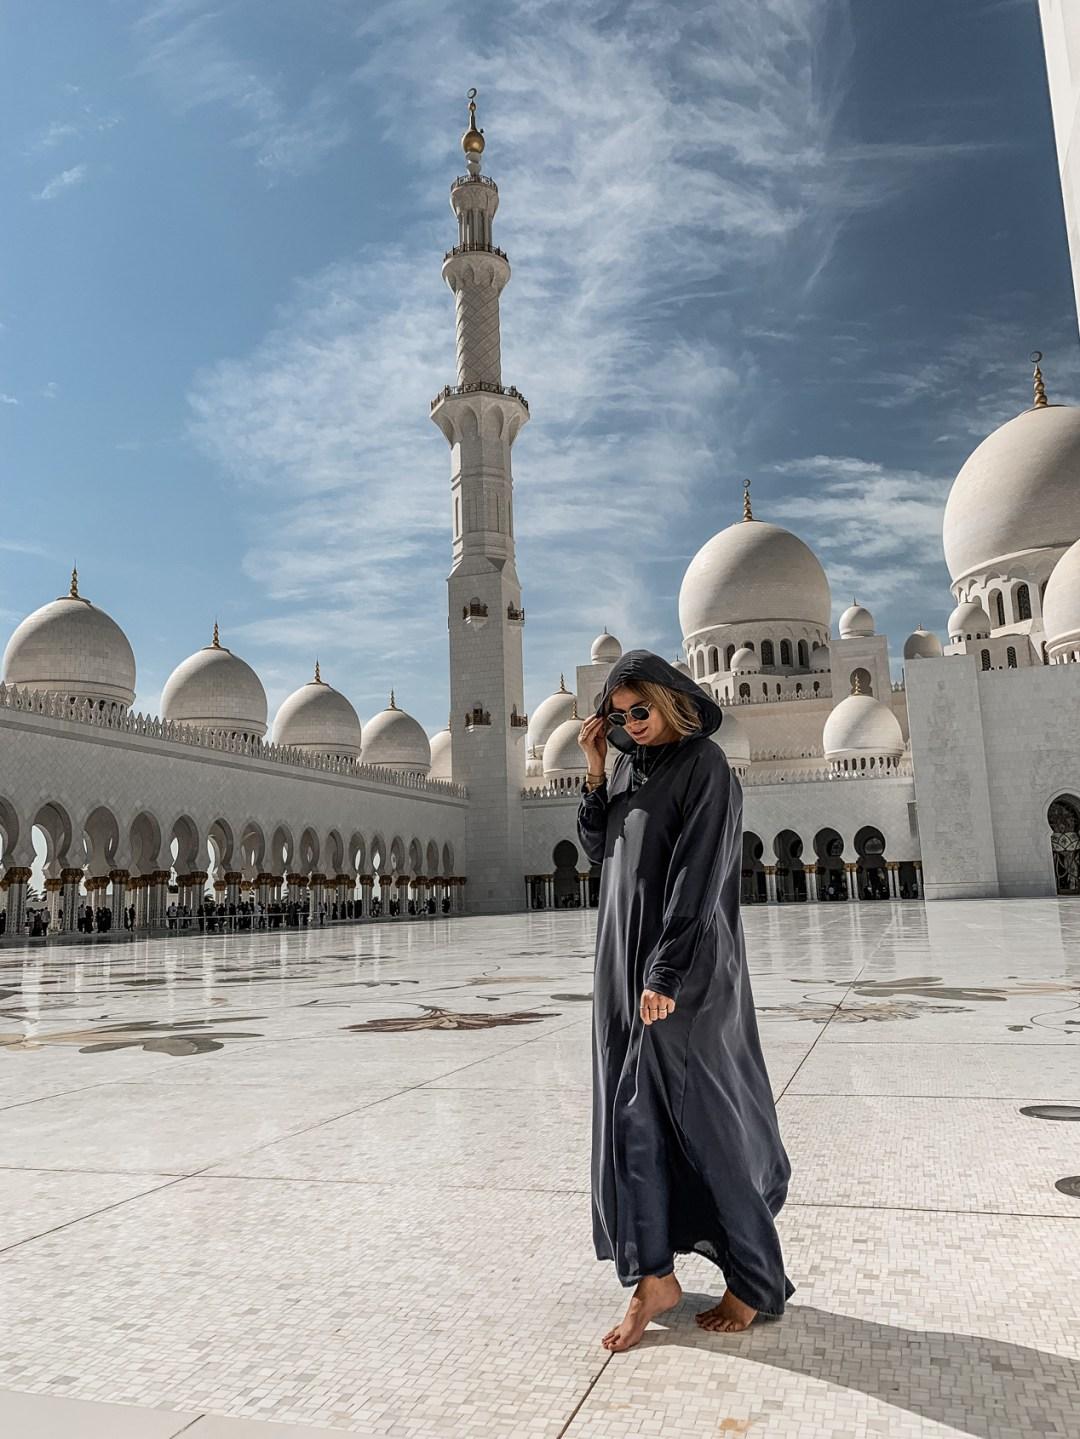 Travel, Abu Dhabi, Must see in Abu Dhabi, Dubai, Visit Abu Dhabi, Traveldiary, Reise nach Abu Dhabi, Was tun in Abu Dhabi, Travelblogger, www.lakatyfox.com Louvre Abu Dhabi